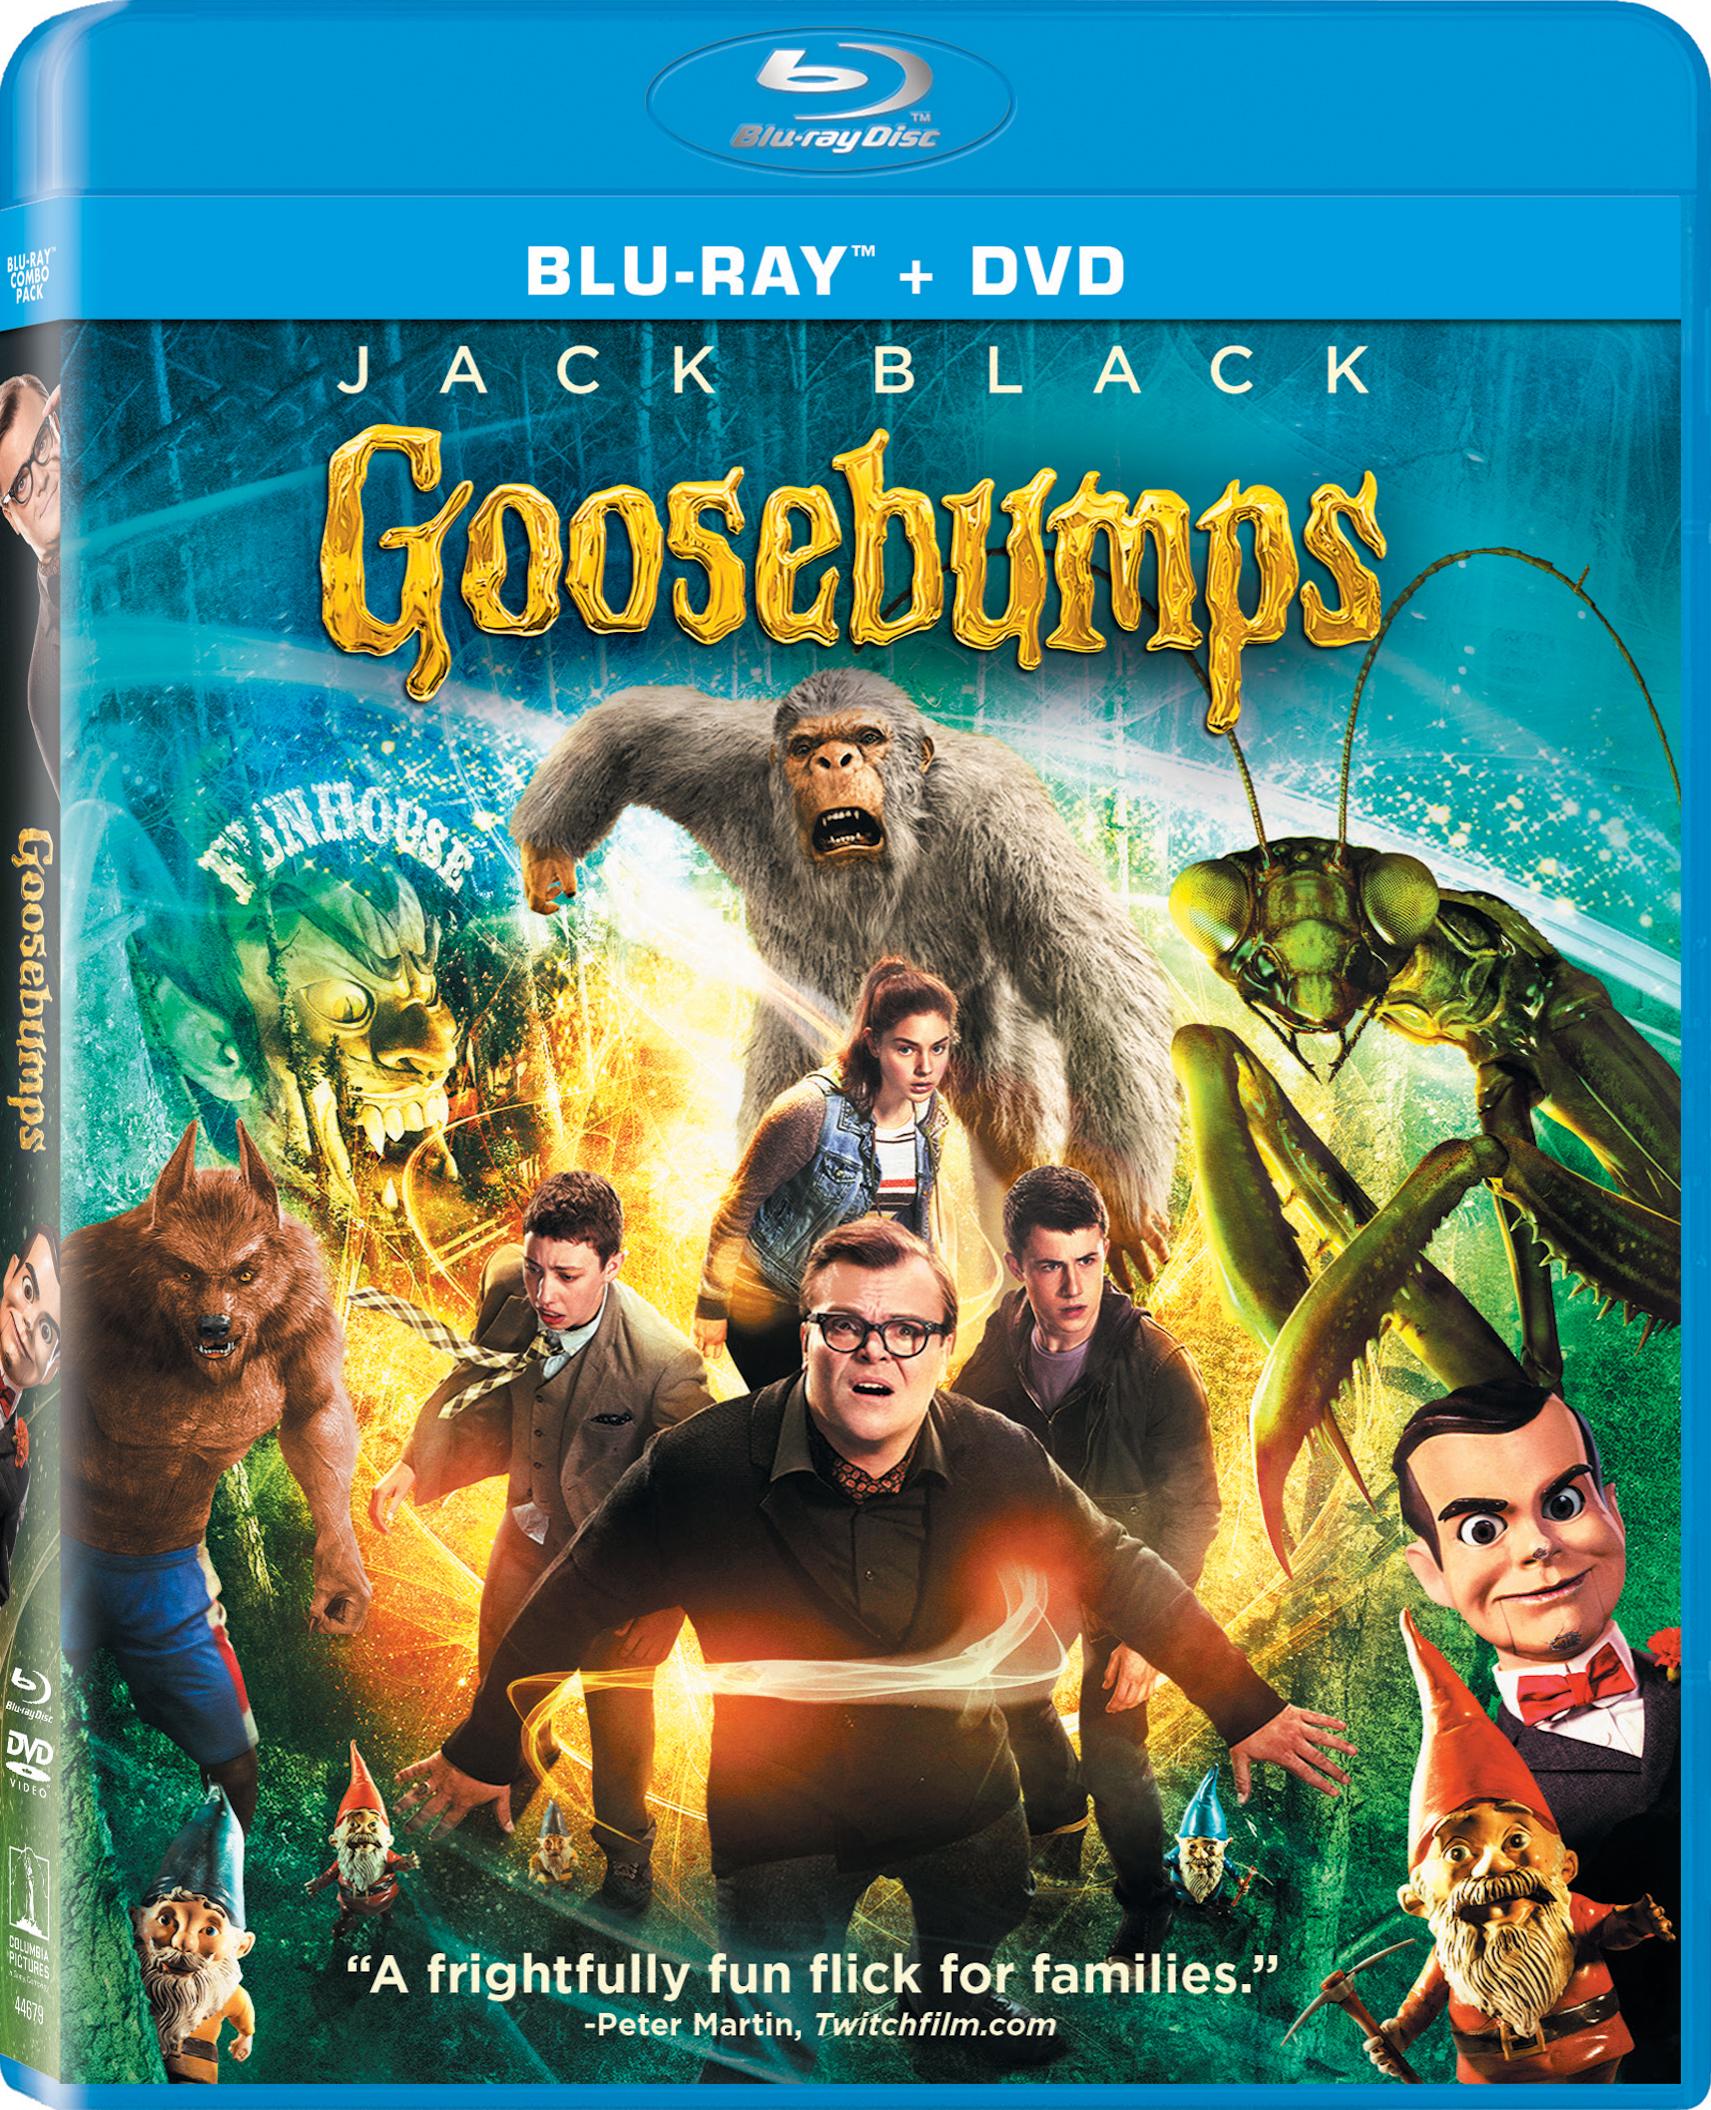 Goosebumps (2015) Blu-ray